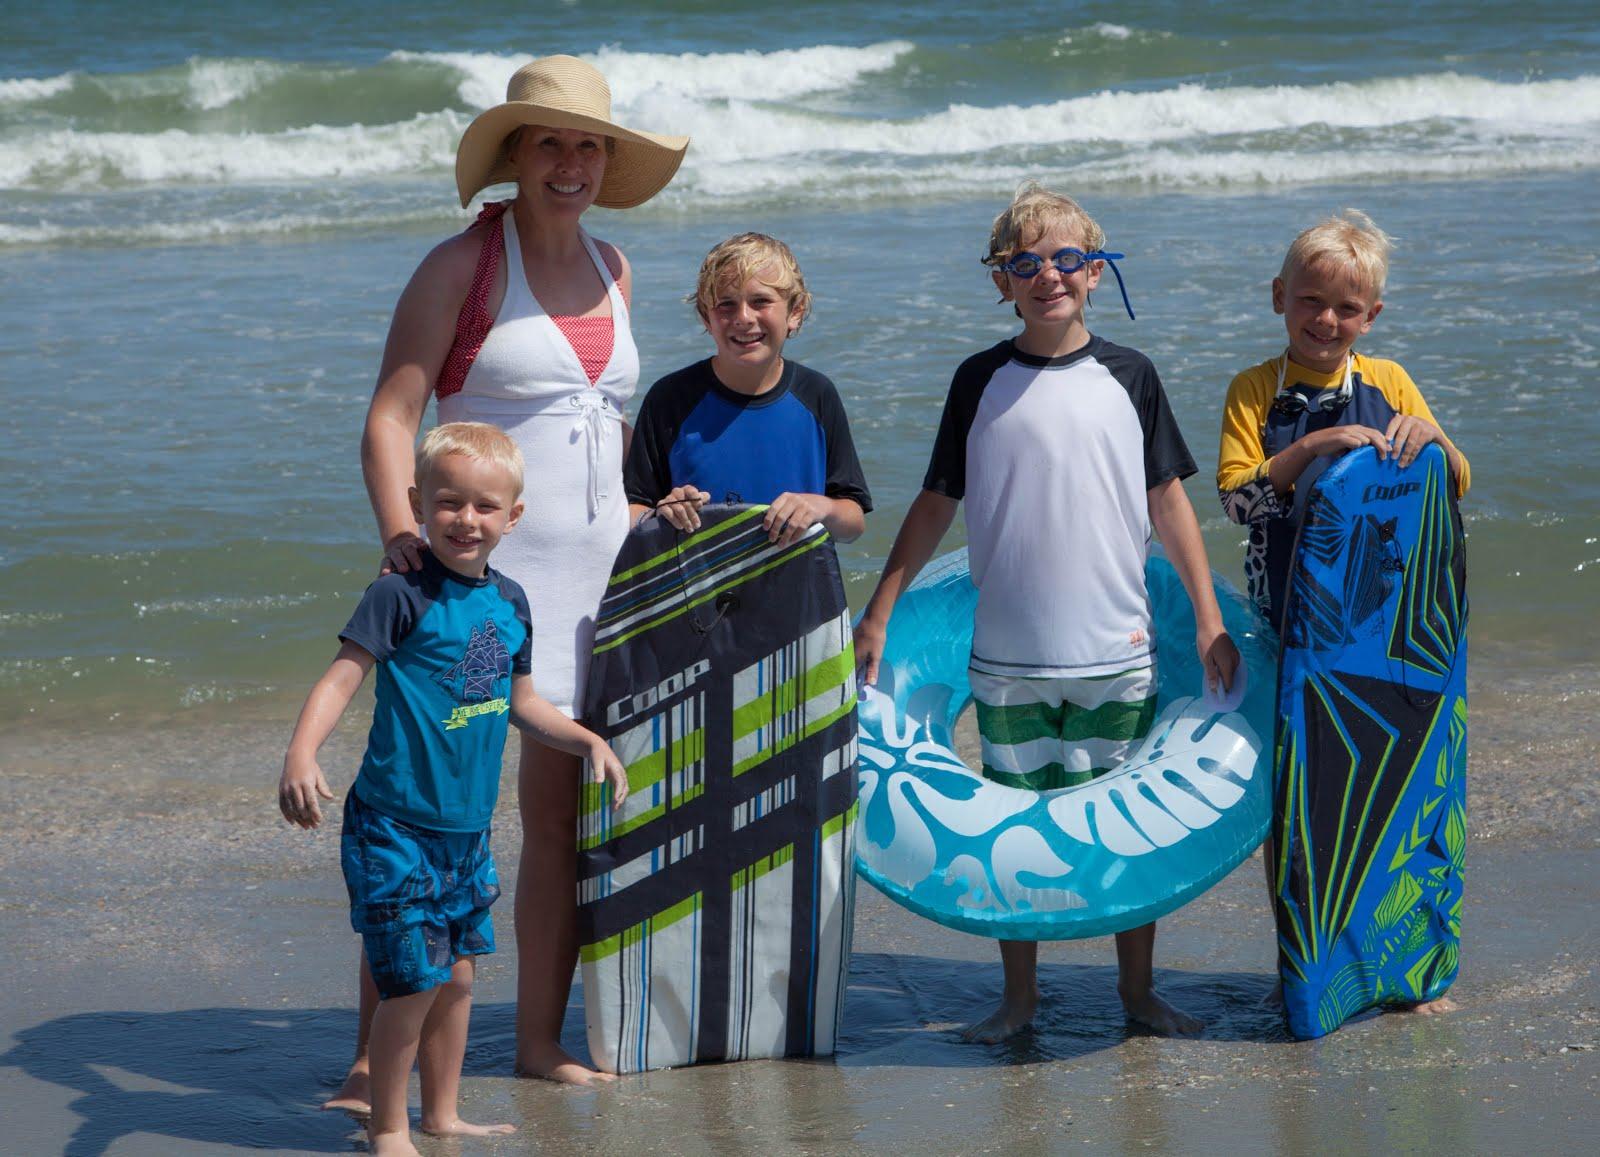 Myrtle Beach, South Carolina 2015